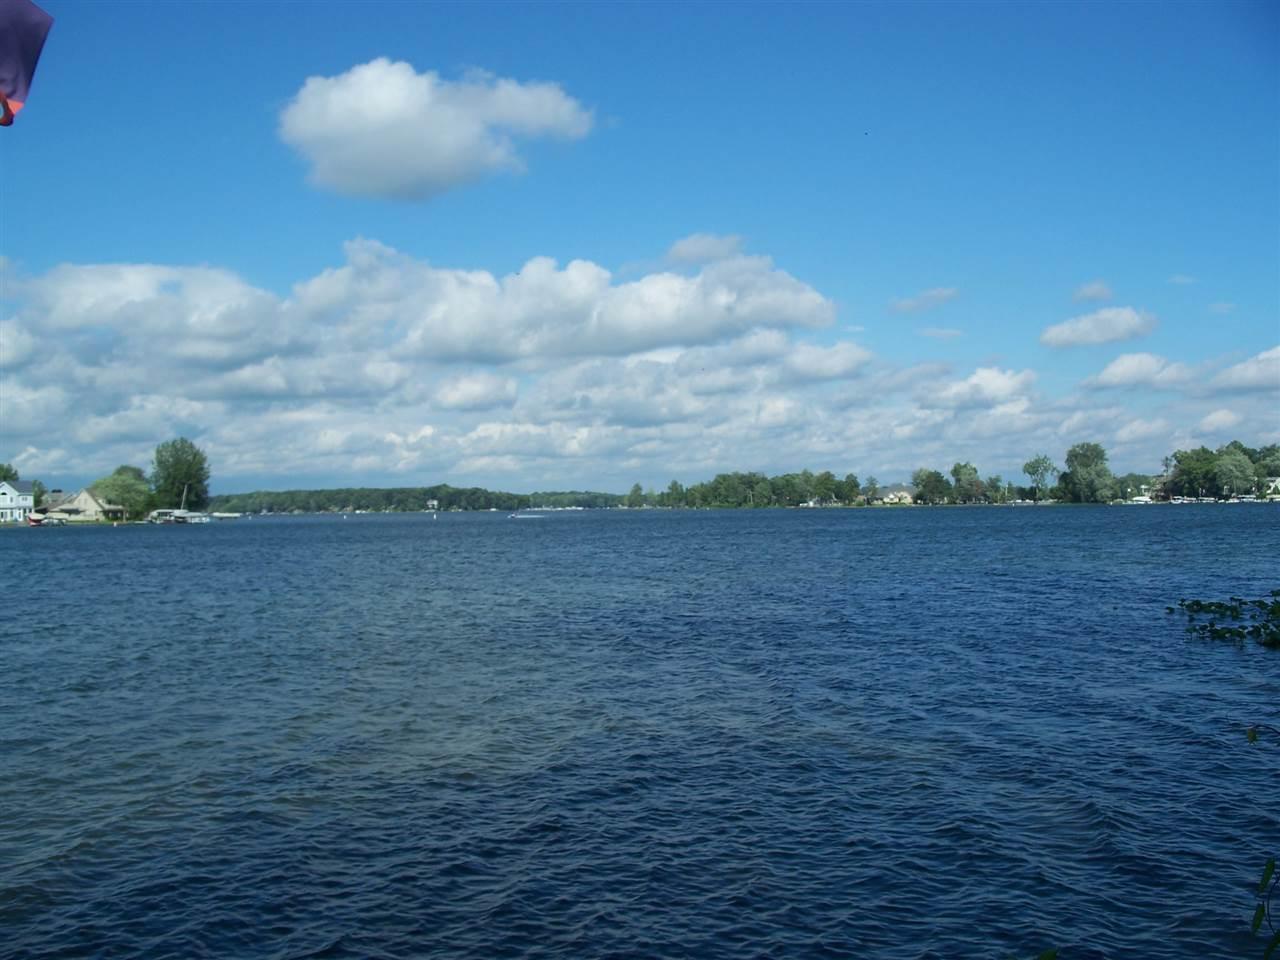 TBD Lake Drive Clear Lake, Fremont, IN 46737